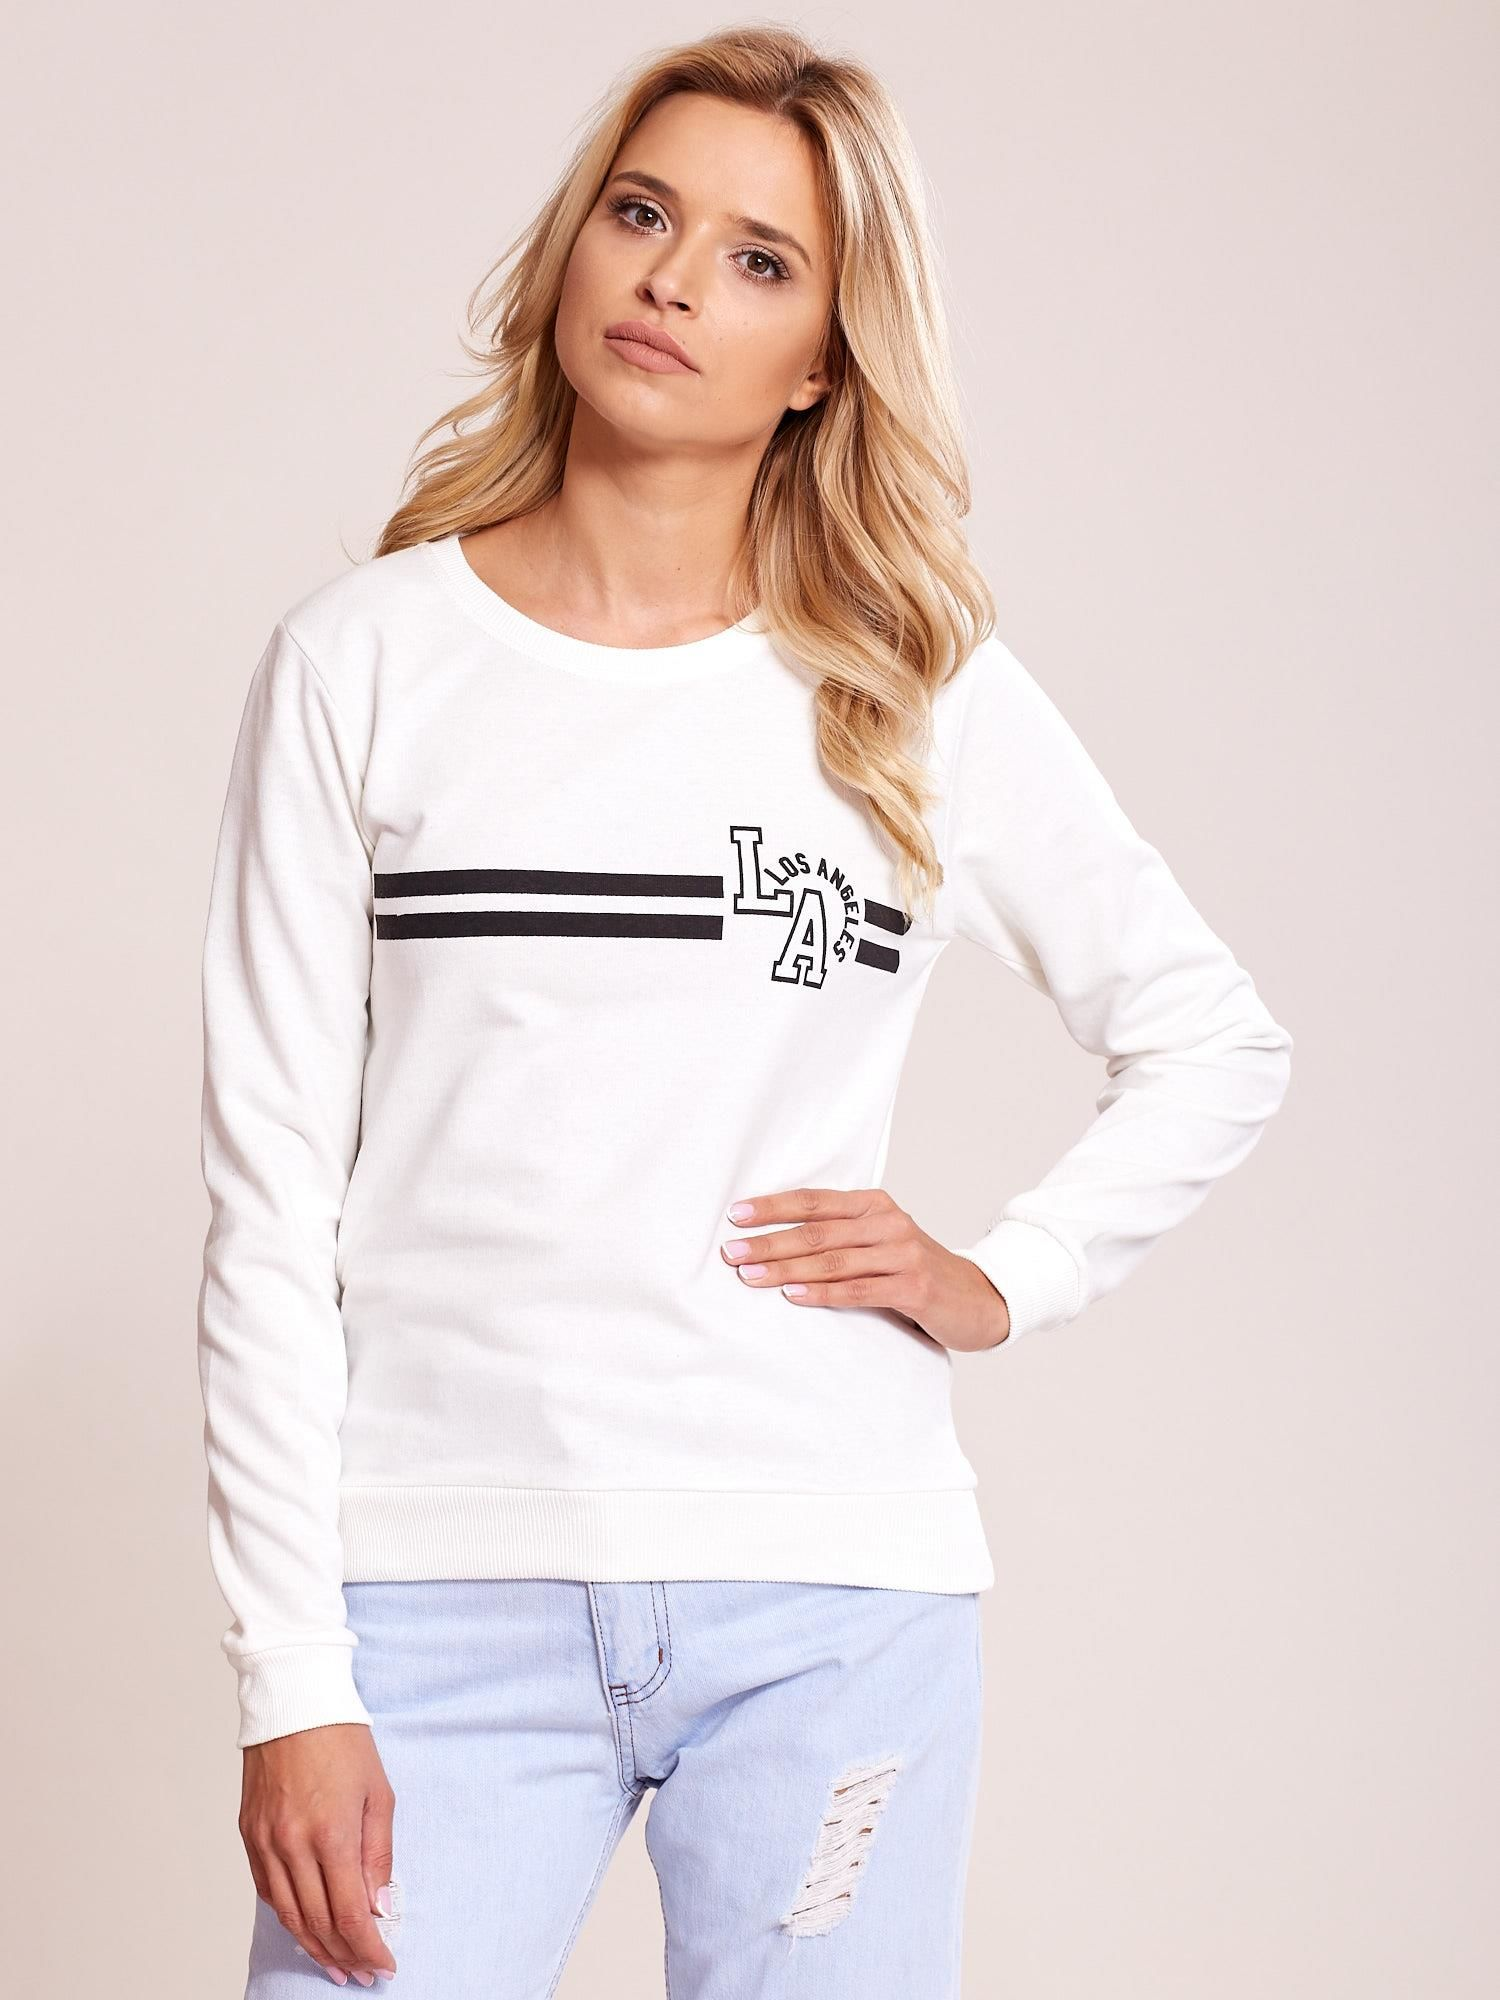 f949700d4e0455 Ecru bluza bawełniana z nadrukiem LOS ANGELES - Bluza bez kaptura ...